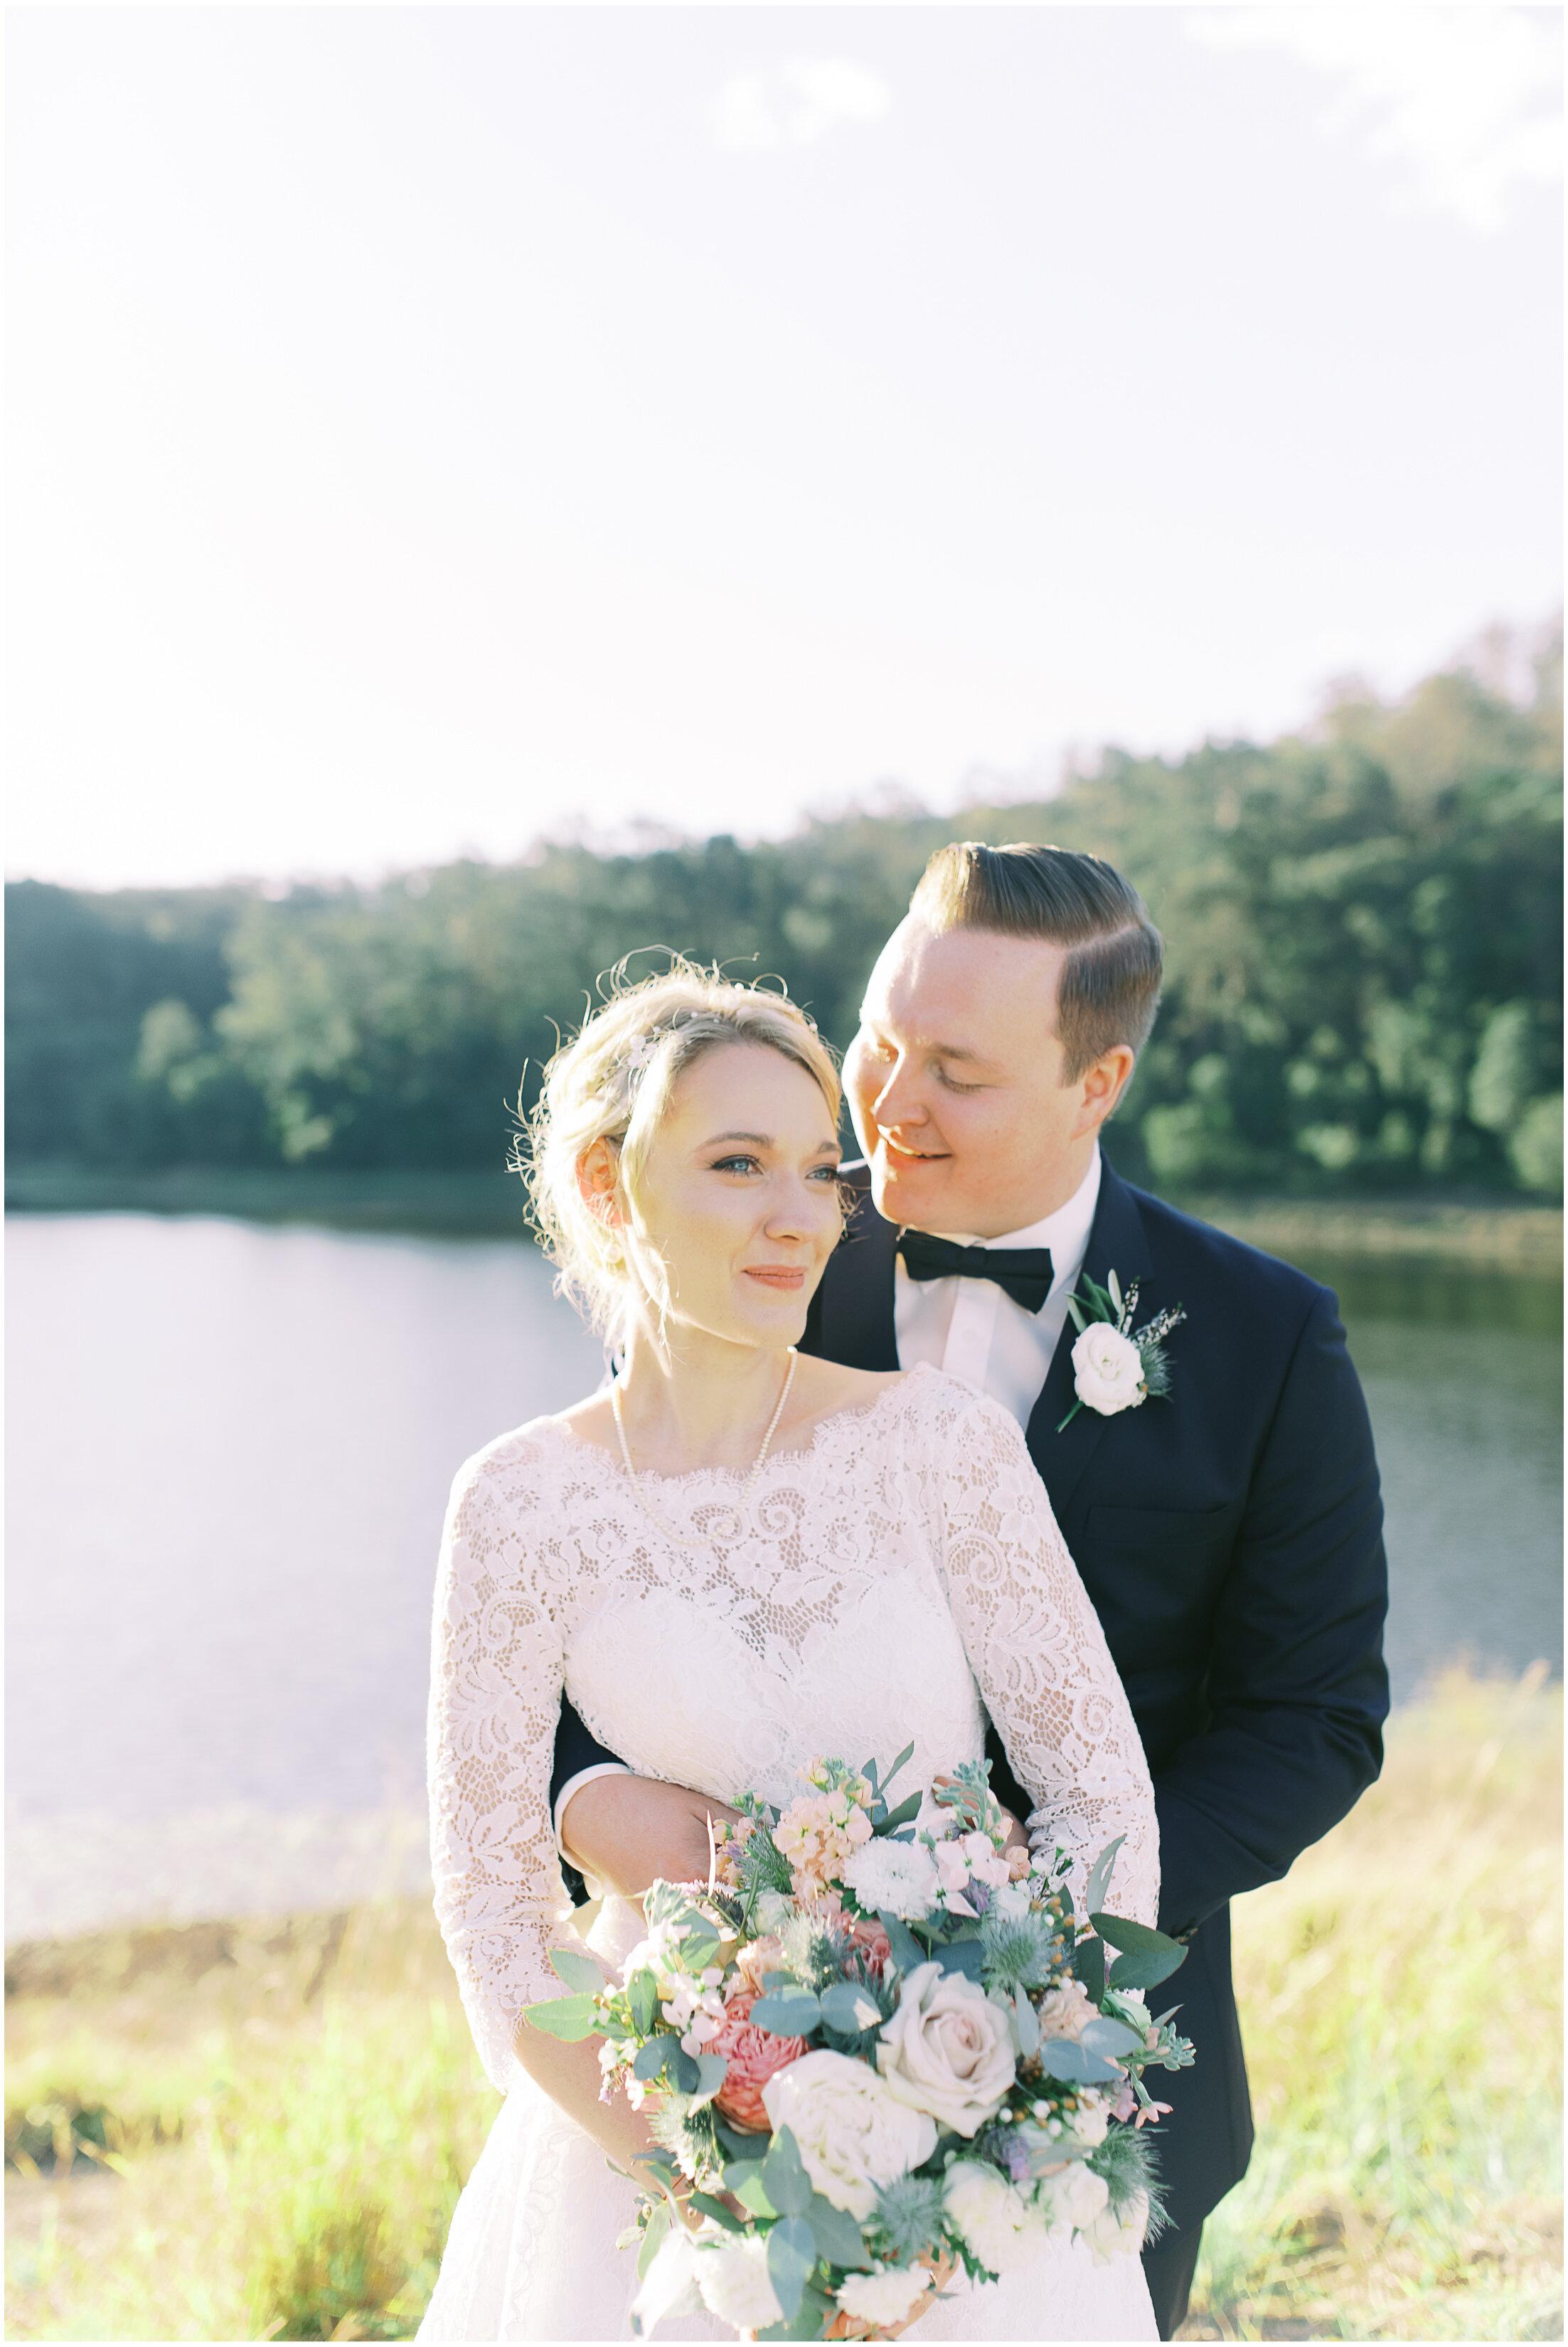 brisbane-fine-art-wedding-photographer-lauren-olivia-luxury-wedding-australia-26.jpg